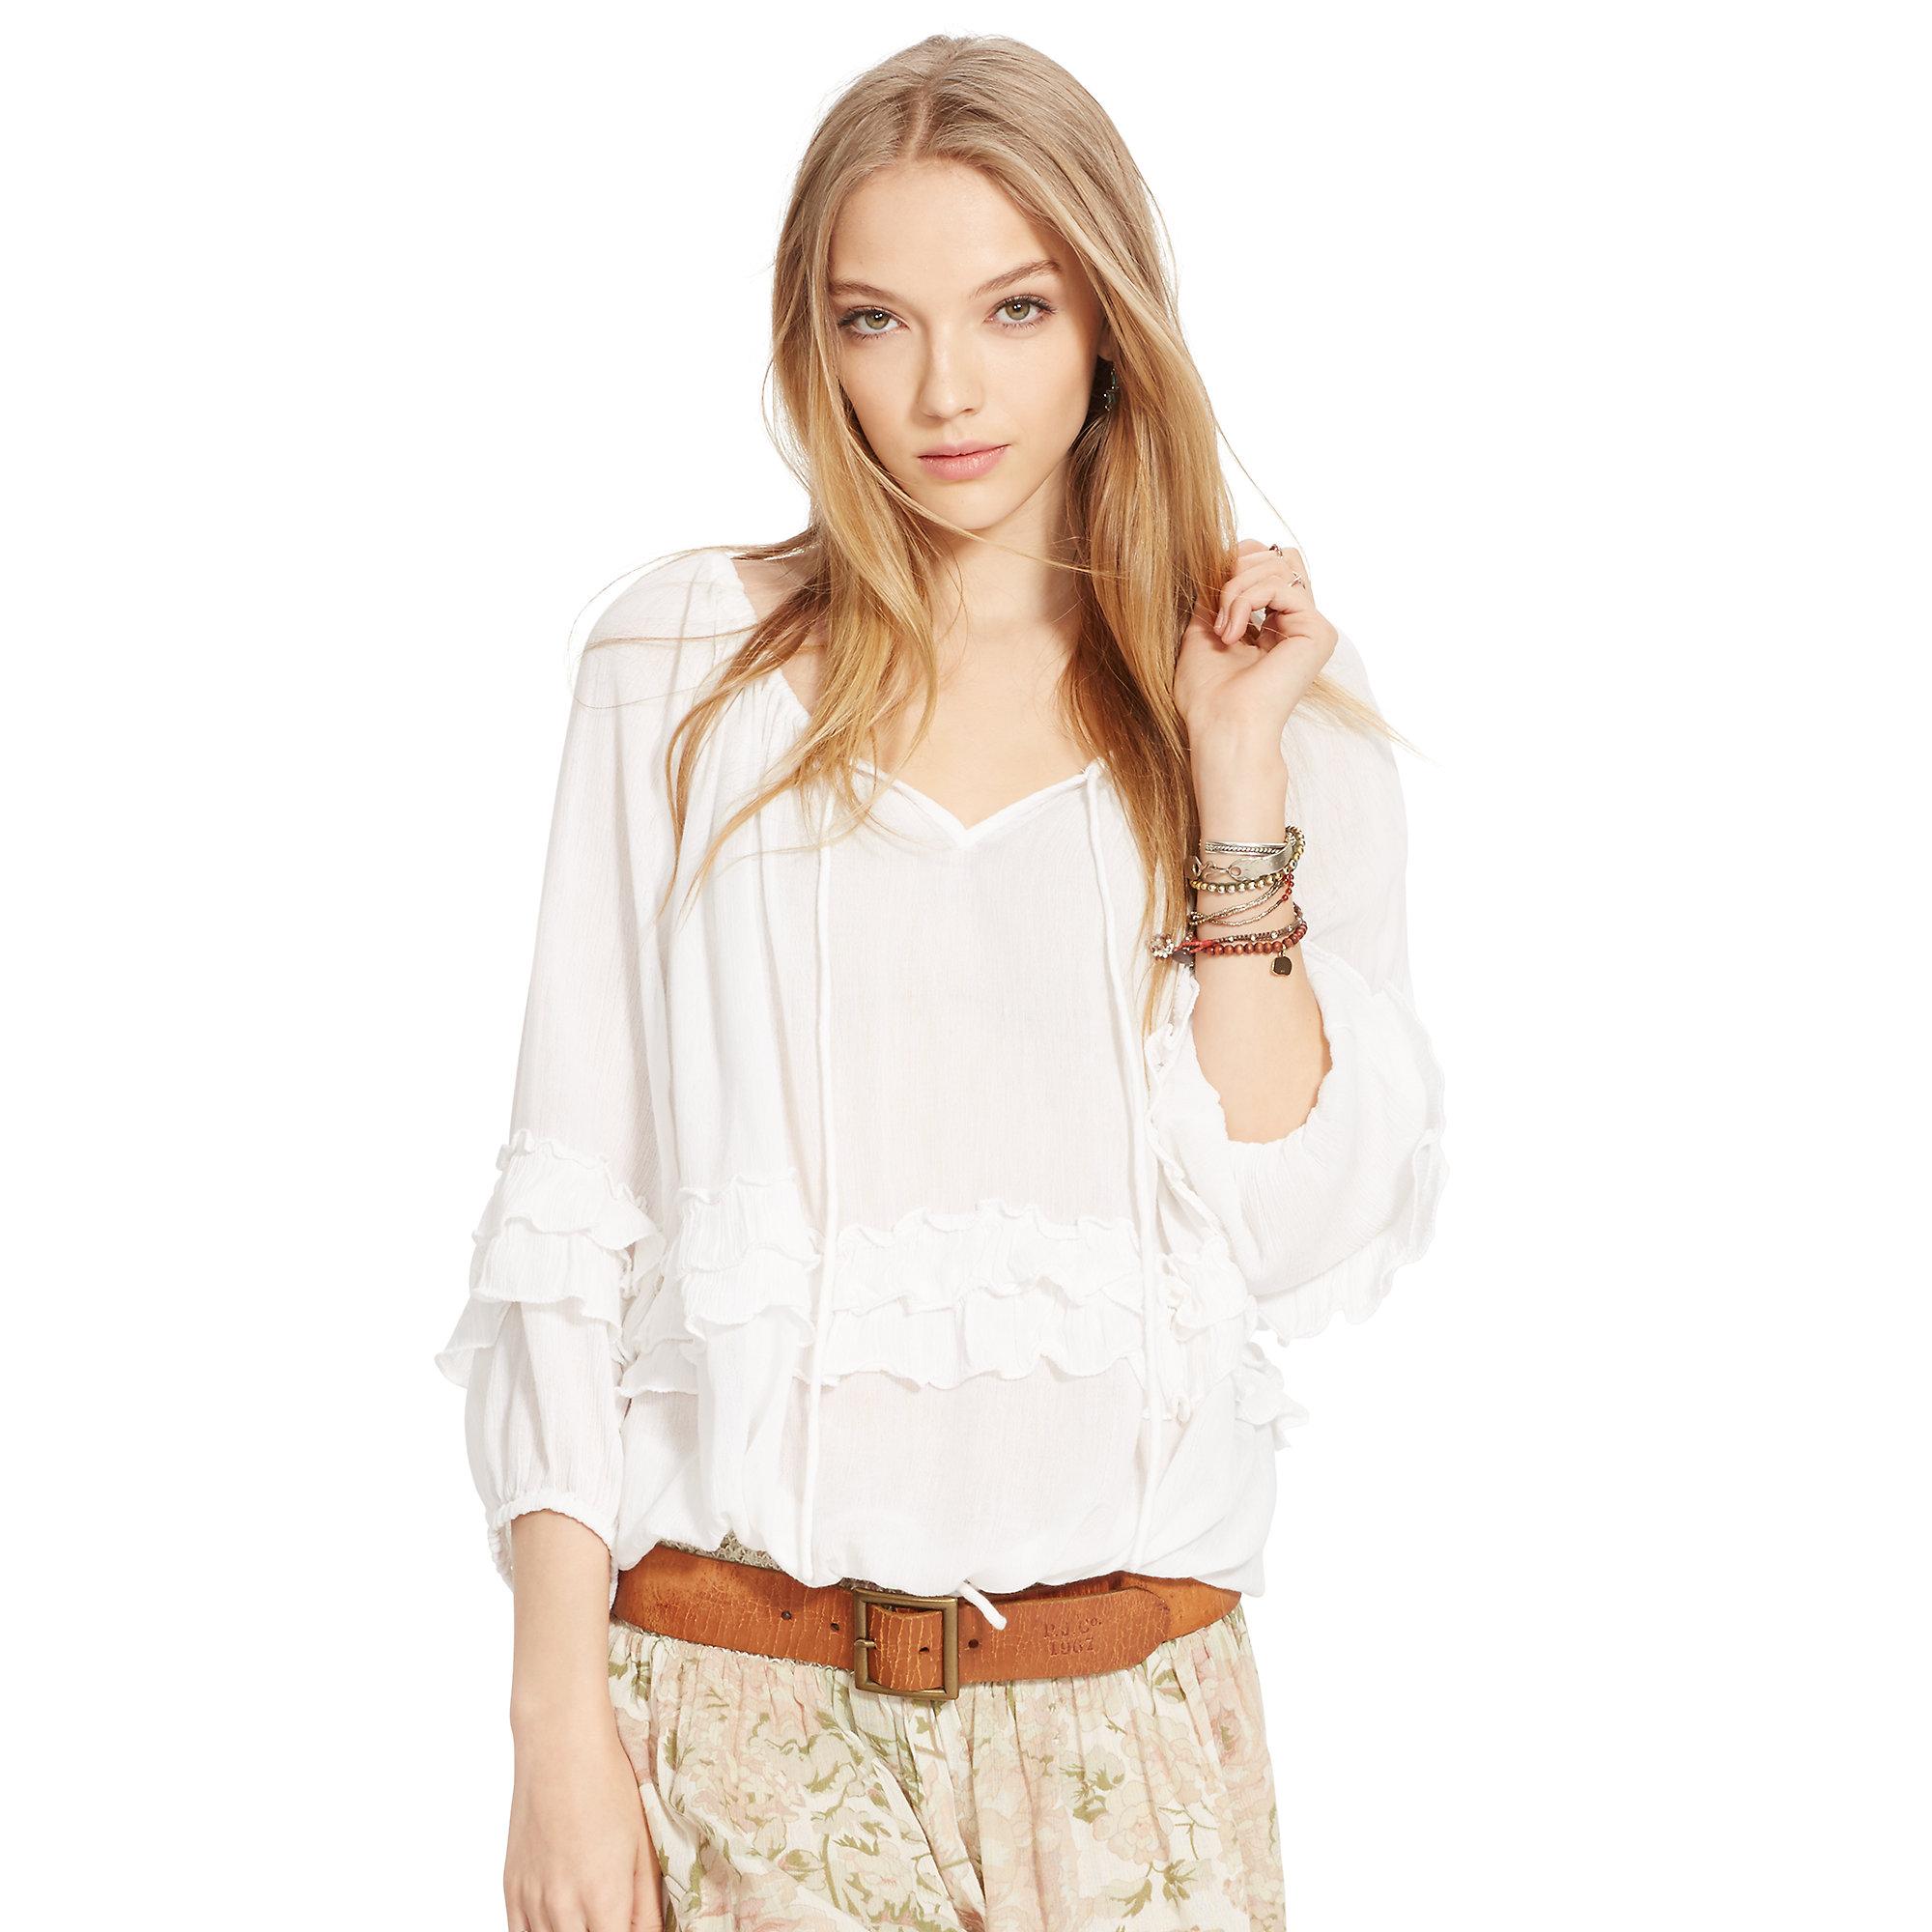 Lyst - Denim   Supply Ralph Lauren Ruffled Boho Top in White 109ab2f08659